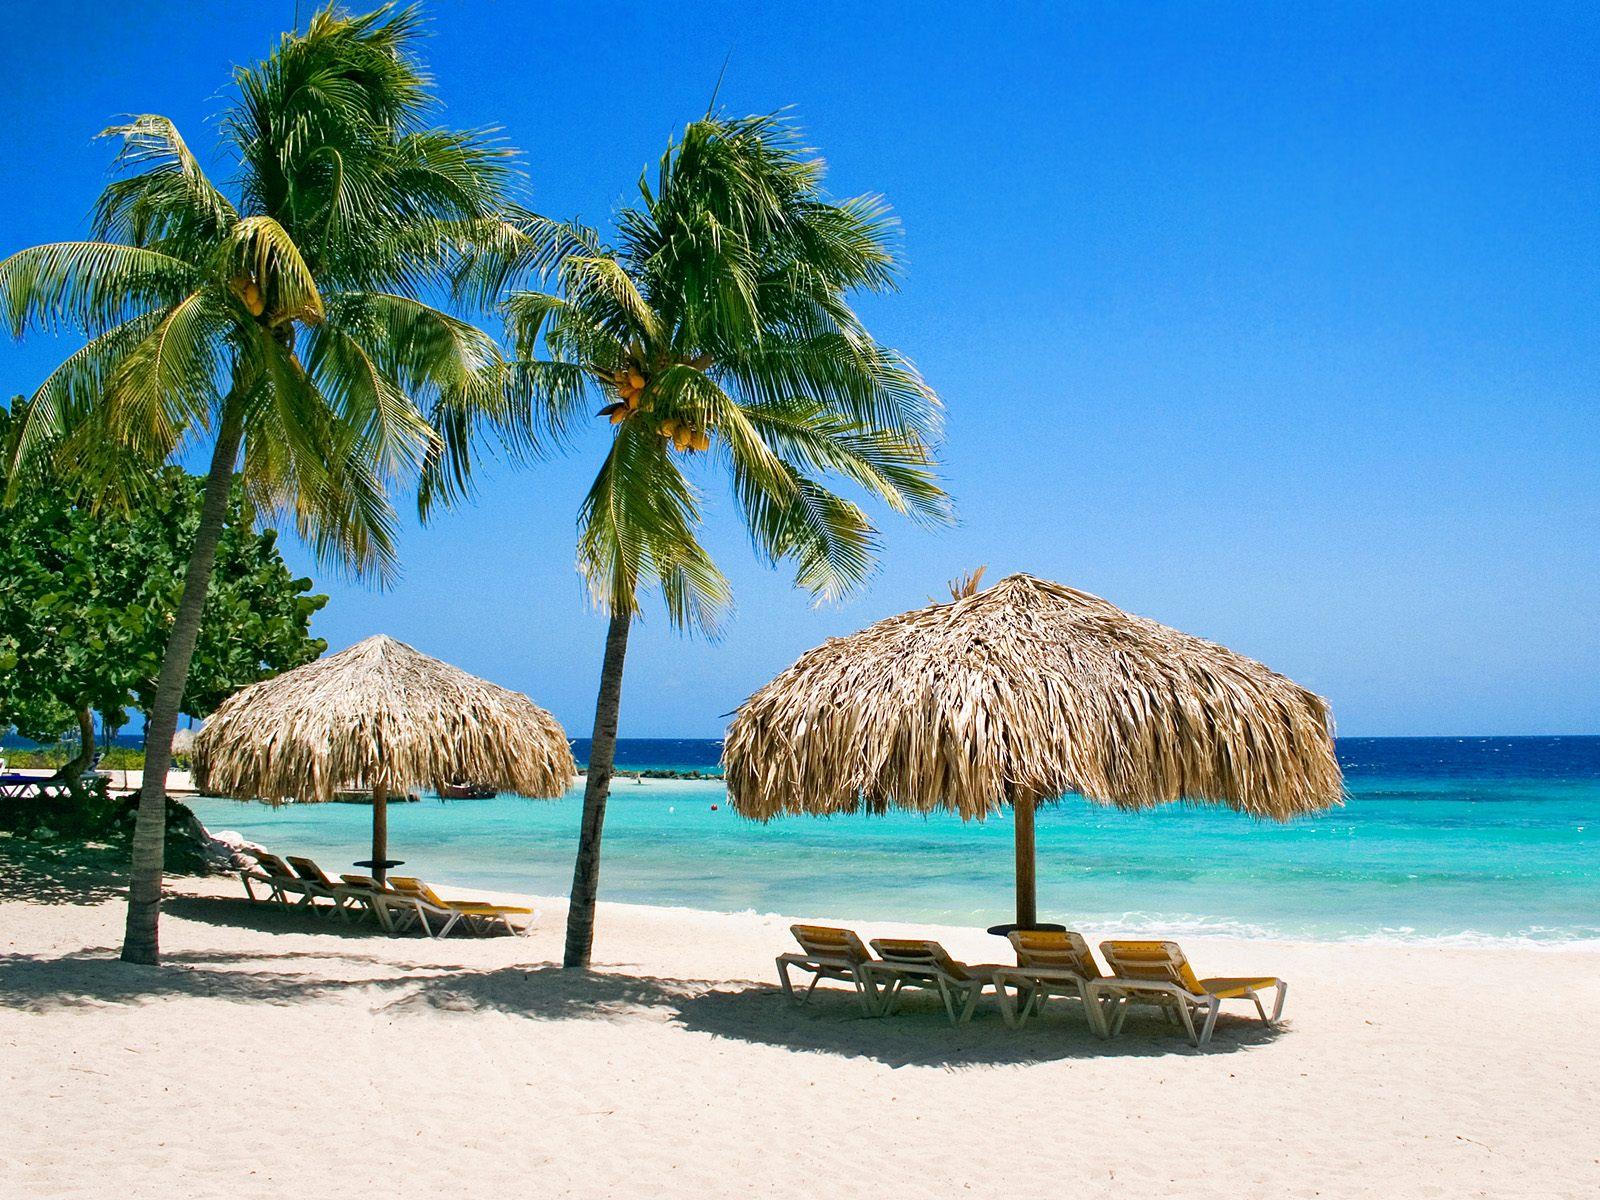 Piscadera_Bay_Curacao_Netherlands_Antilles